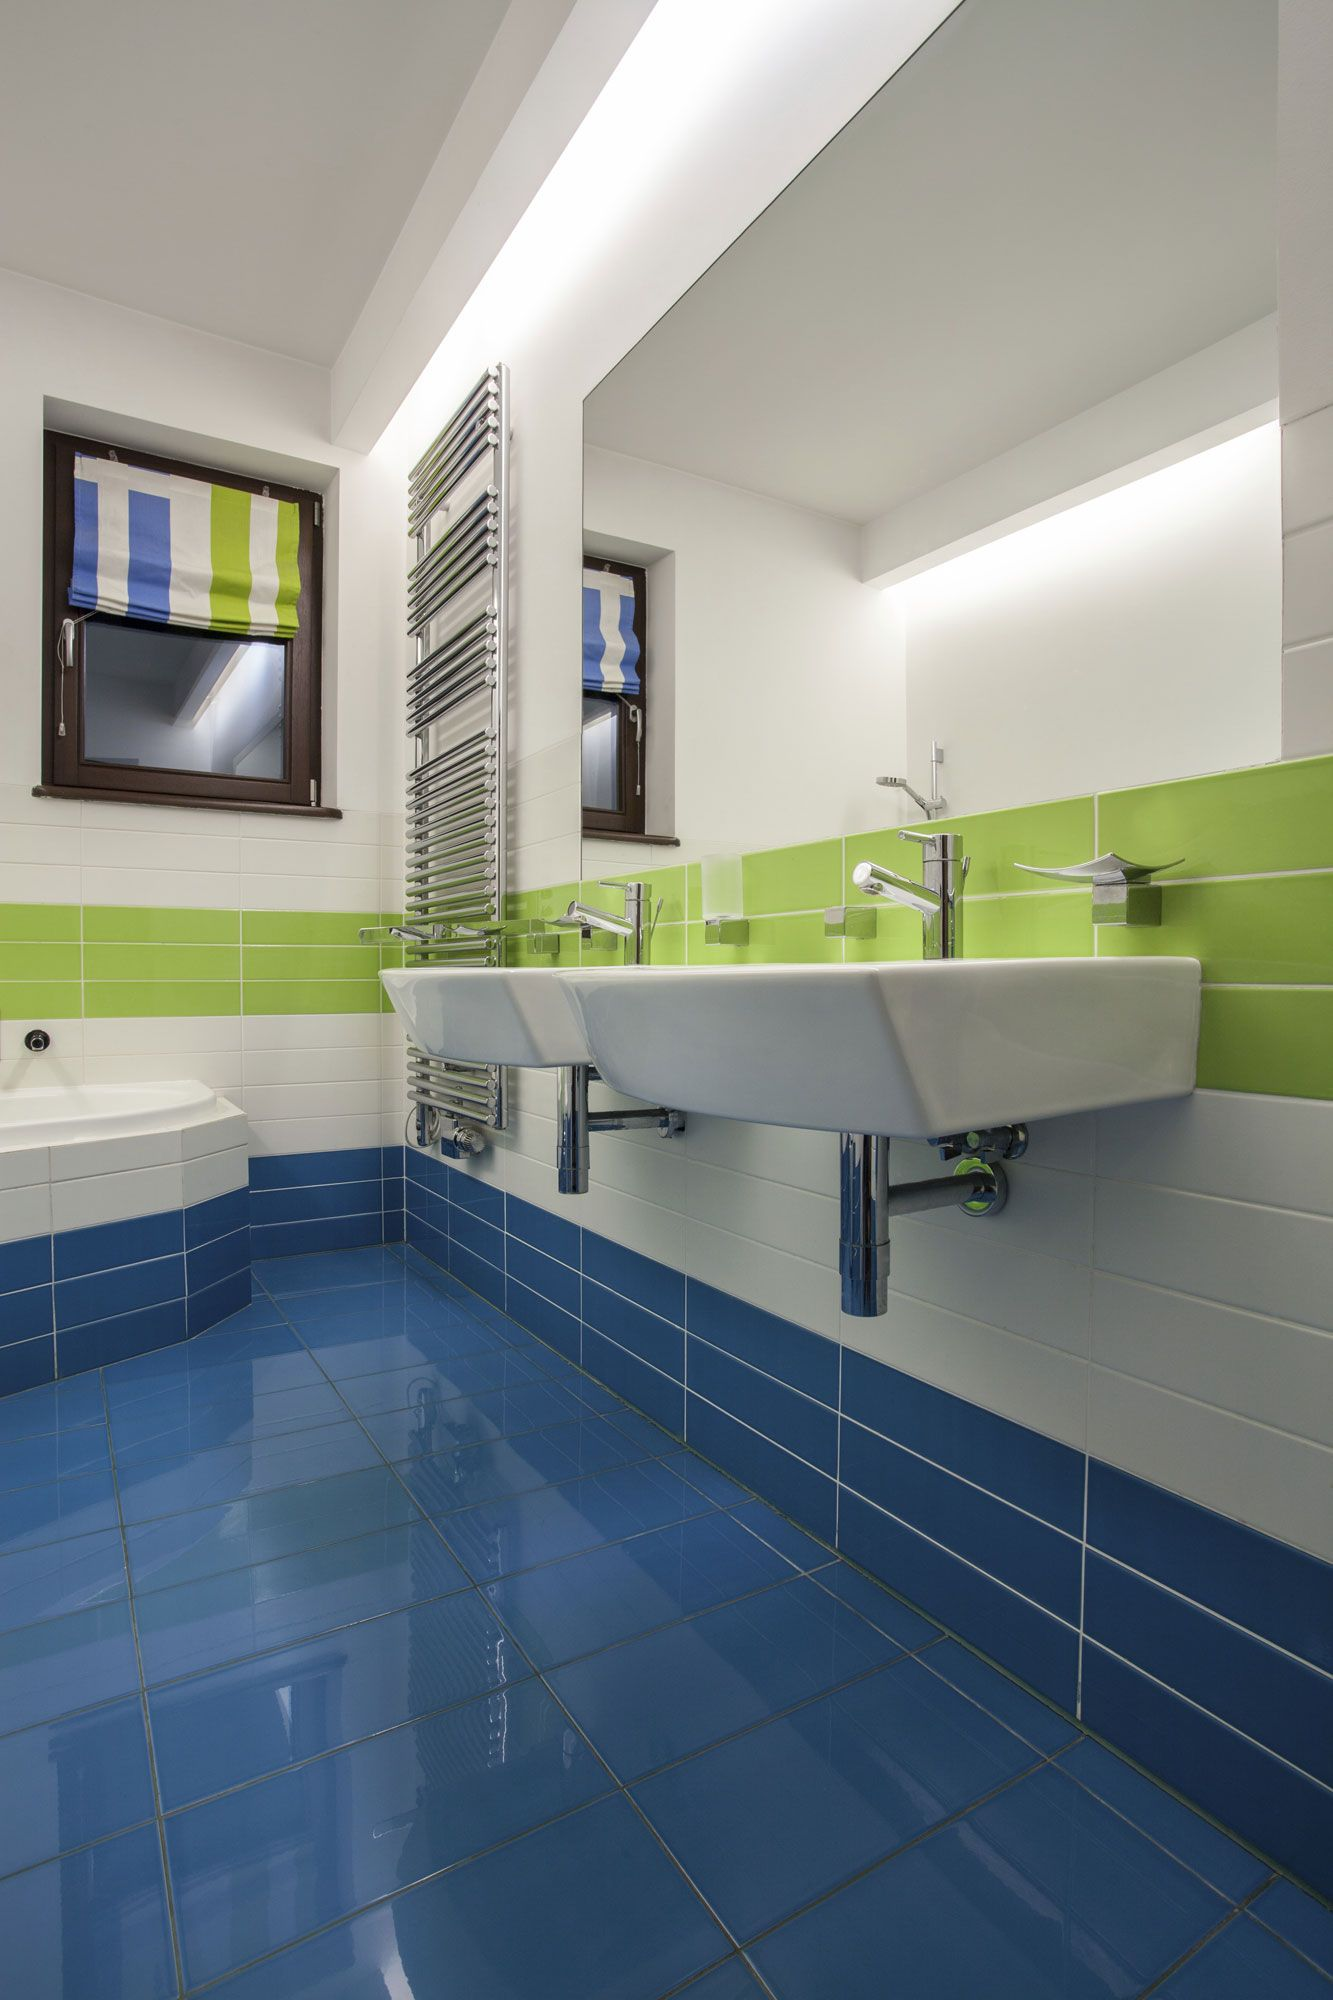 Décor de salle de bain en vert et bleu